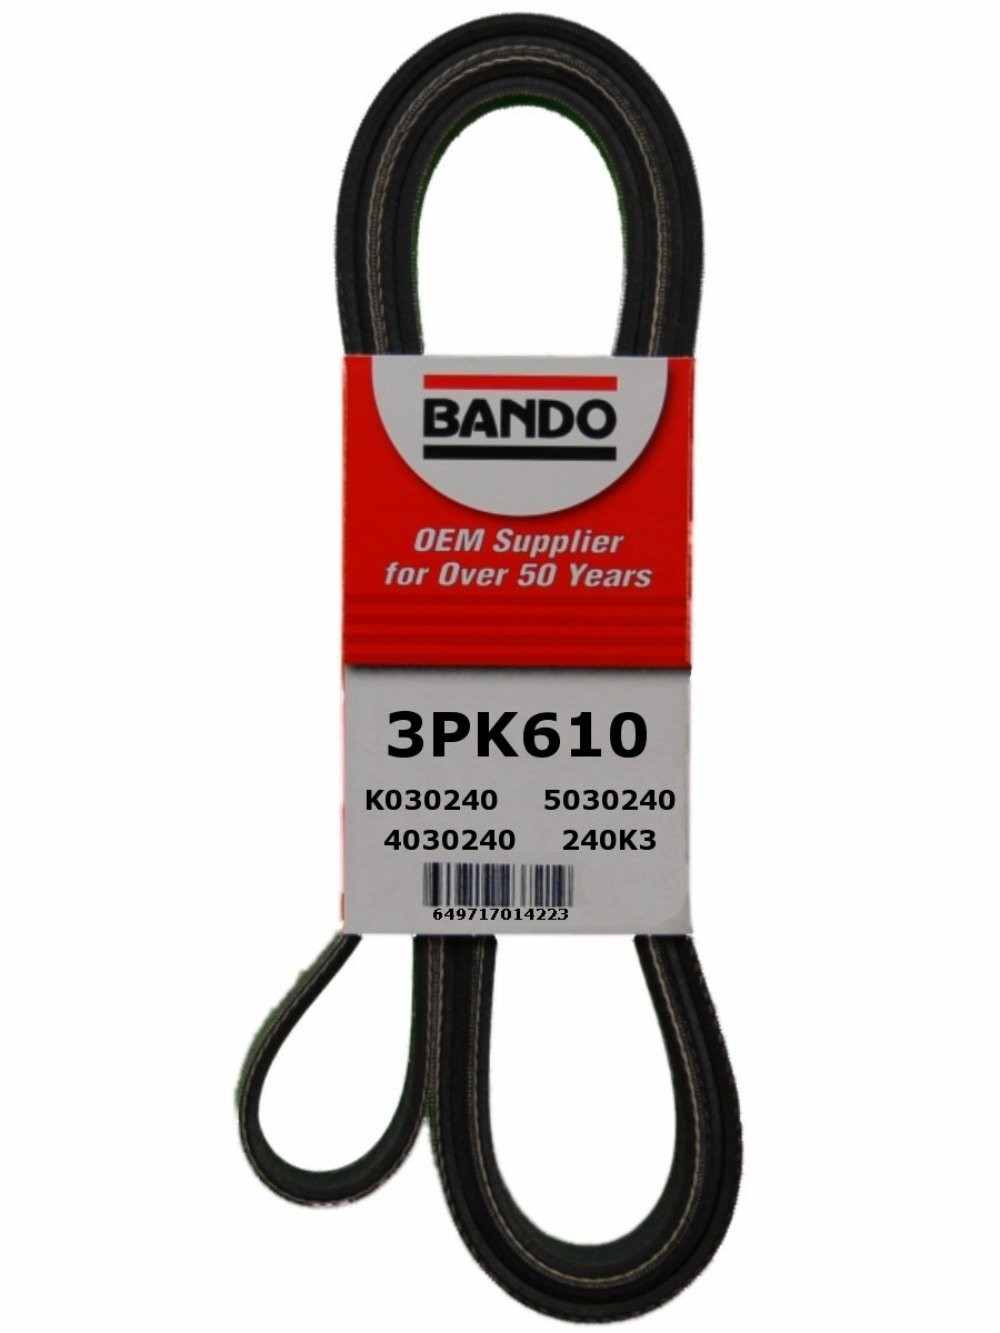 BANDO - Rib Ace Precision Engineered V-Ribbed Belt - BWO 3PK610